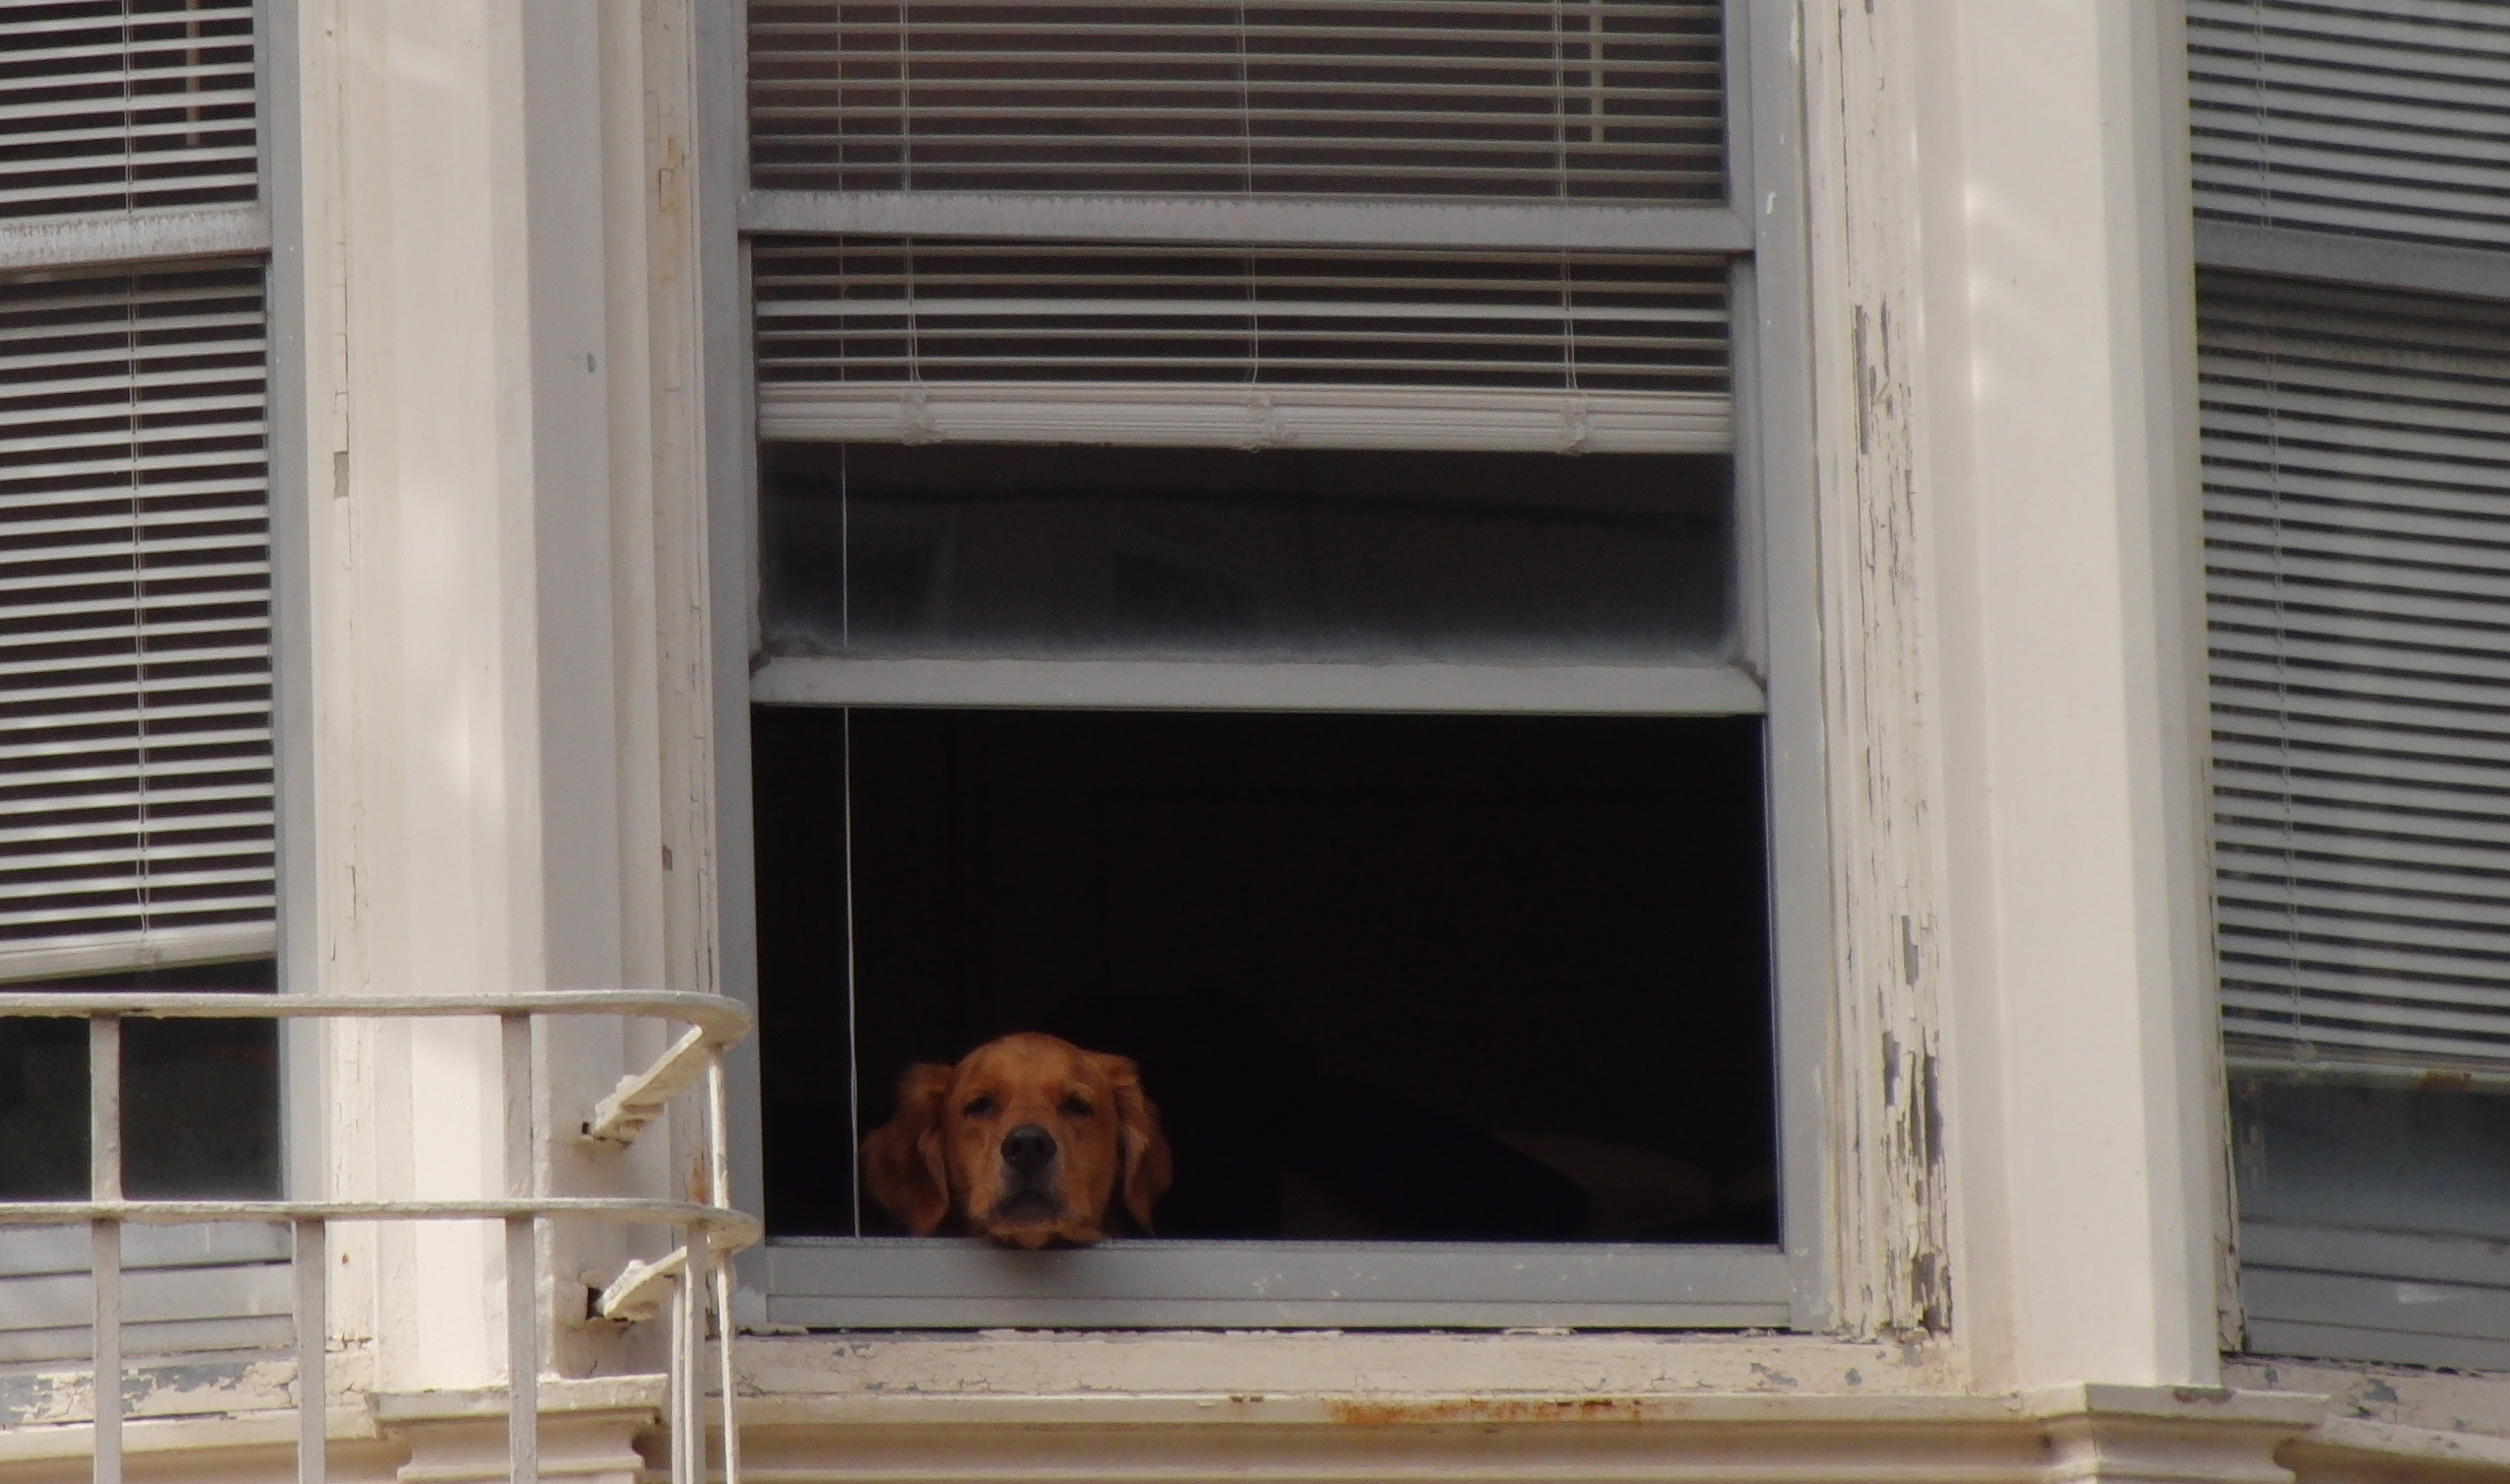 Labrador Retriever Mix In Window